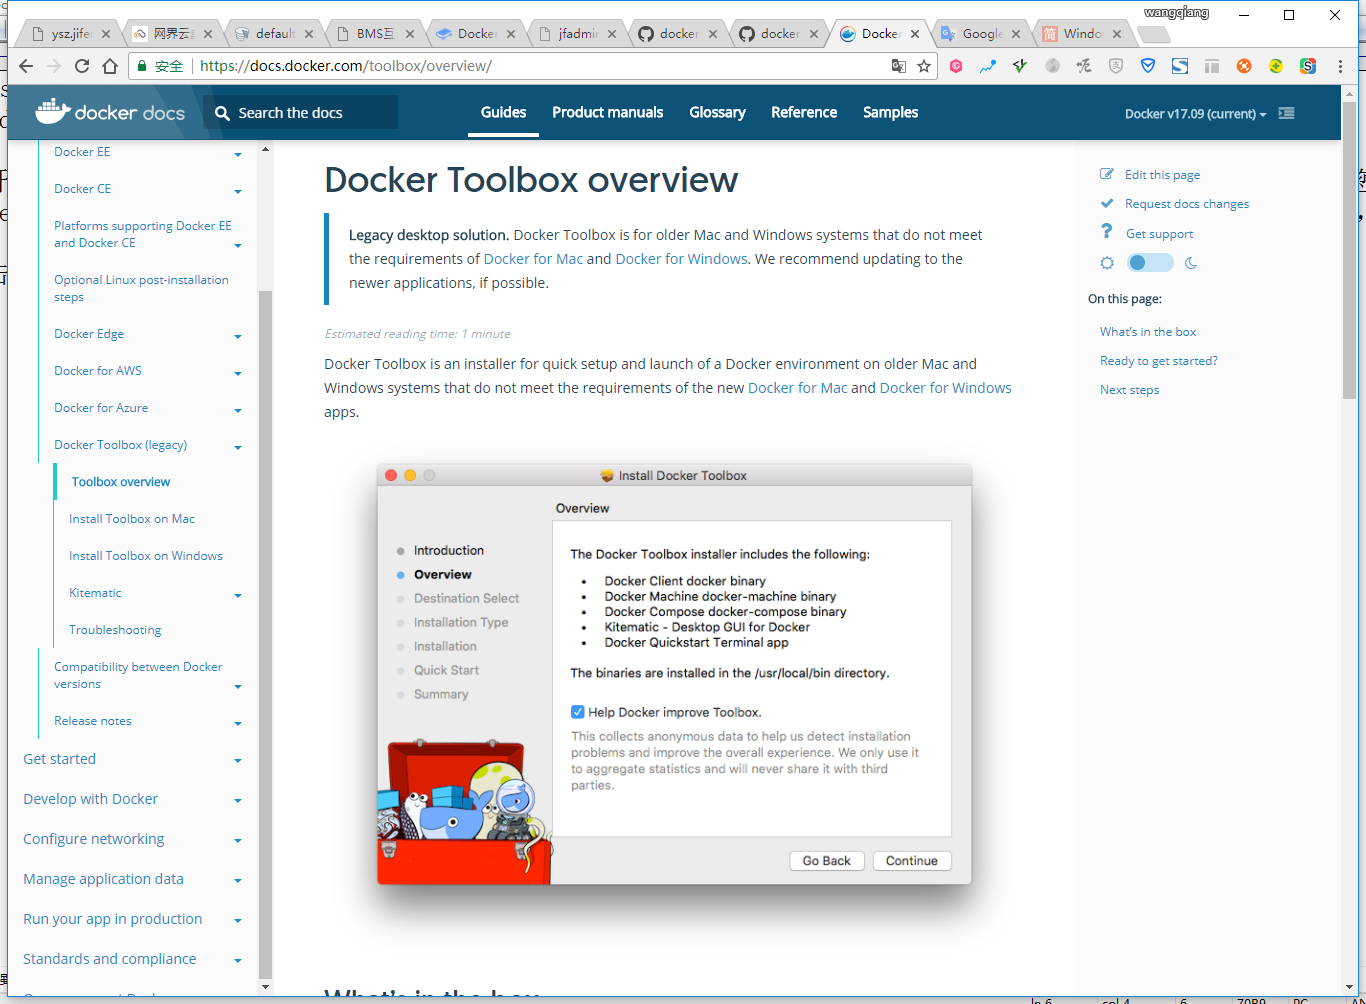 点击 Docker Toolbox 链接,进入:https://docs.docker.com/toolbox/overview/